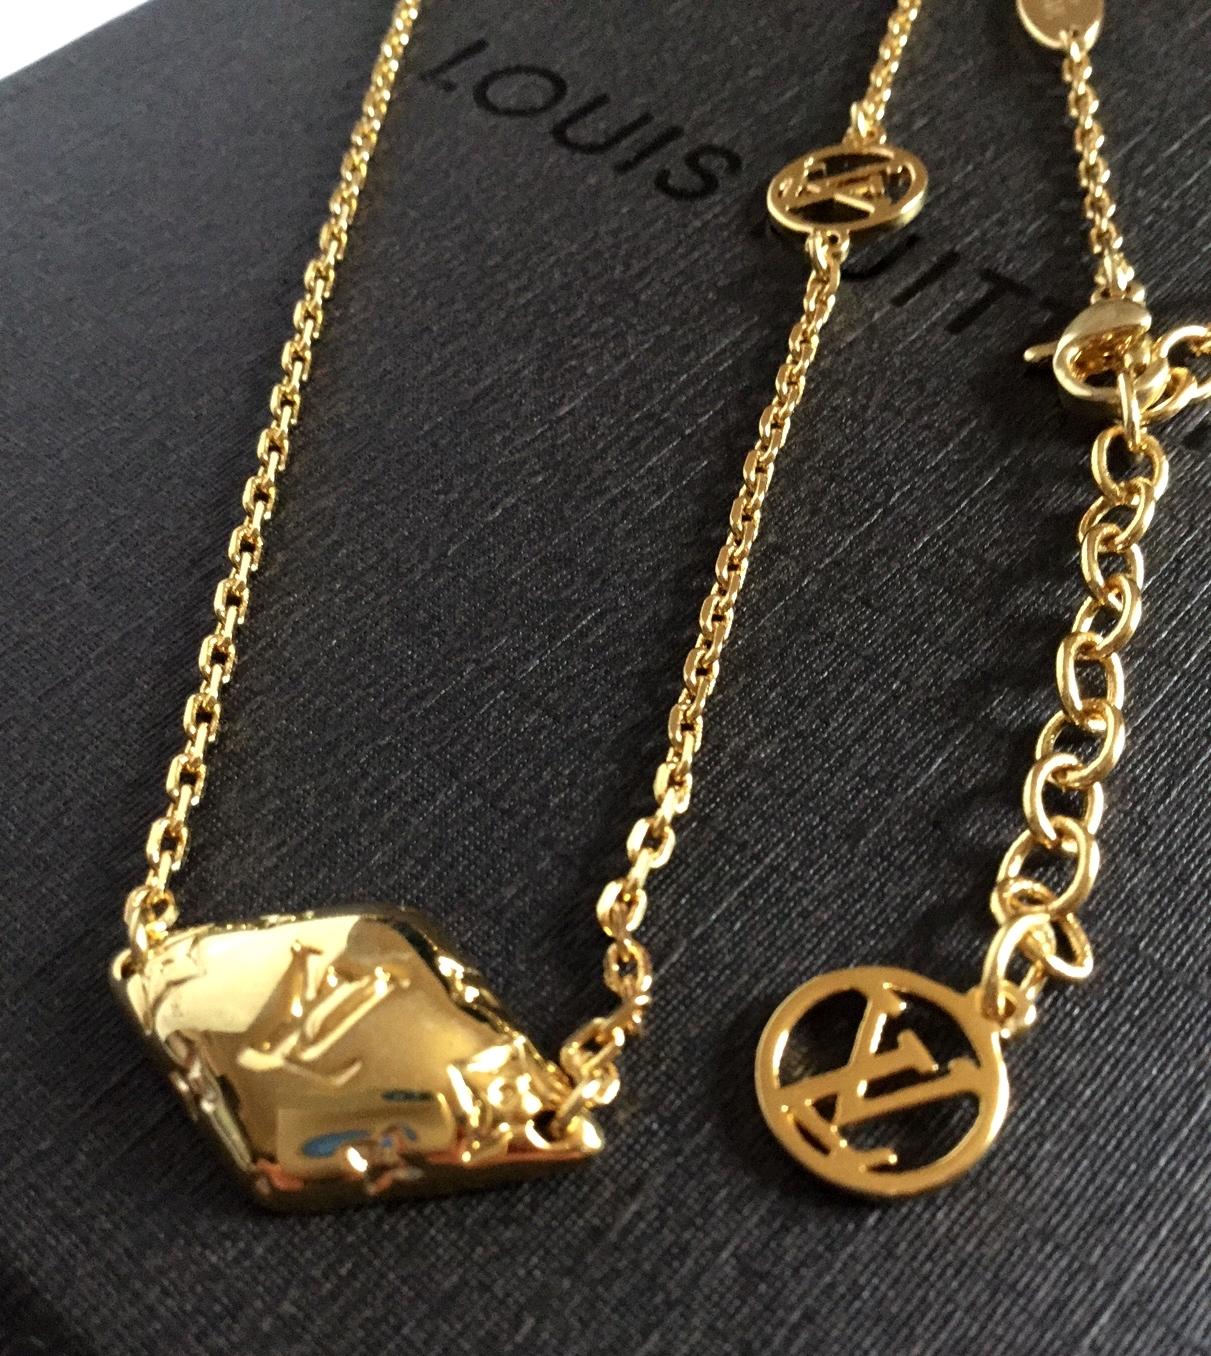 LOUIS VUITTON Malletage Necklace Pendant Gold Palladium ...